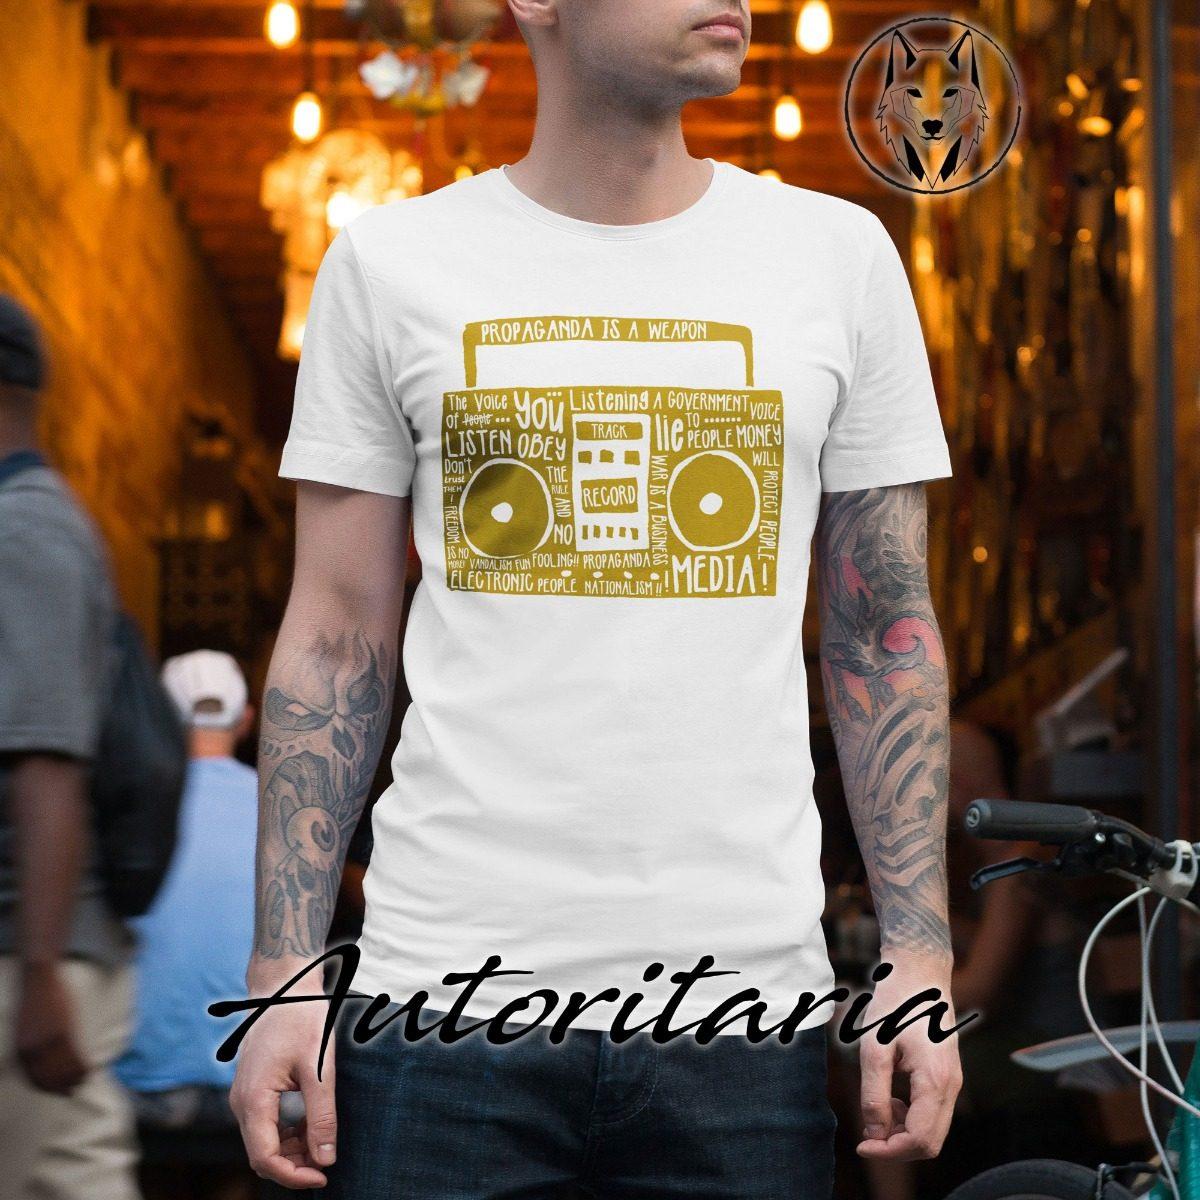 Is J67 A Camiseta Propaganda Weapon Autoritaria Hombre 8PN0wknXO